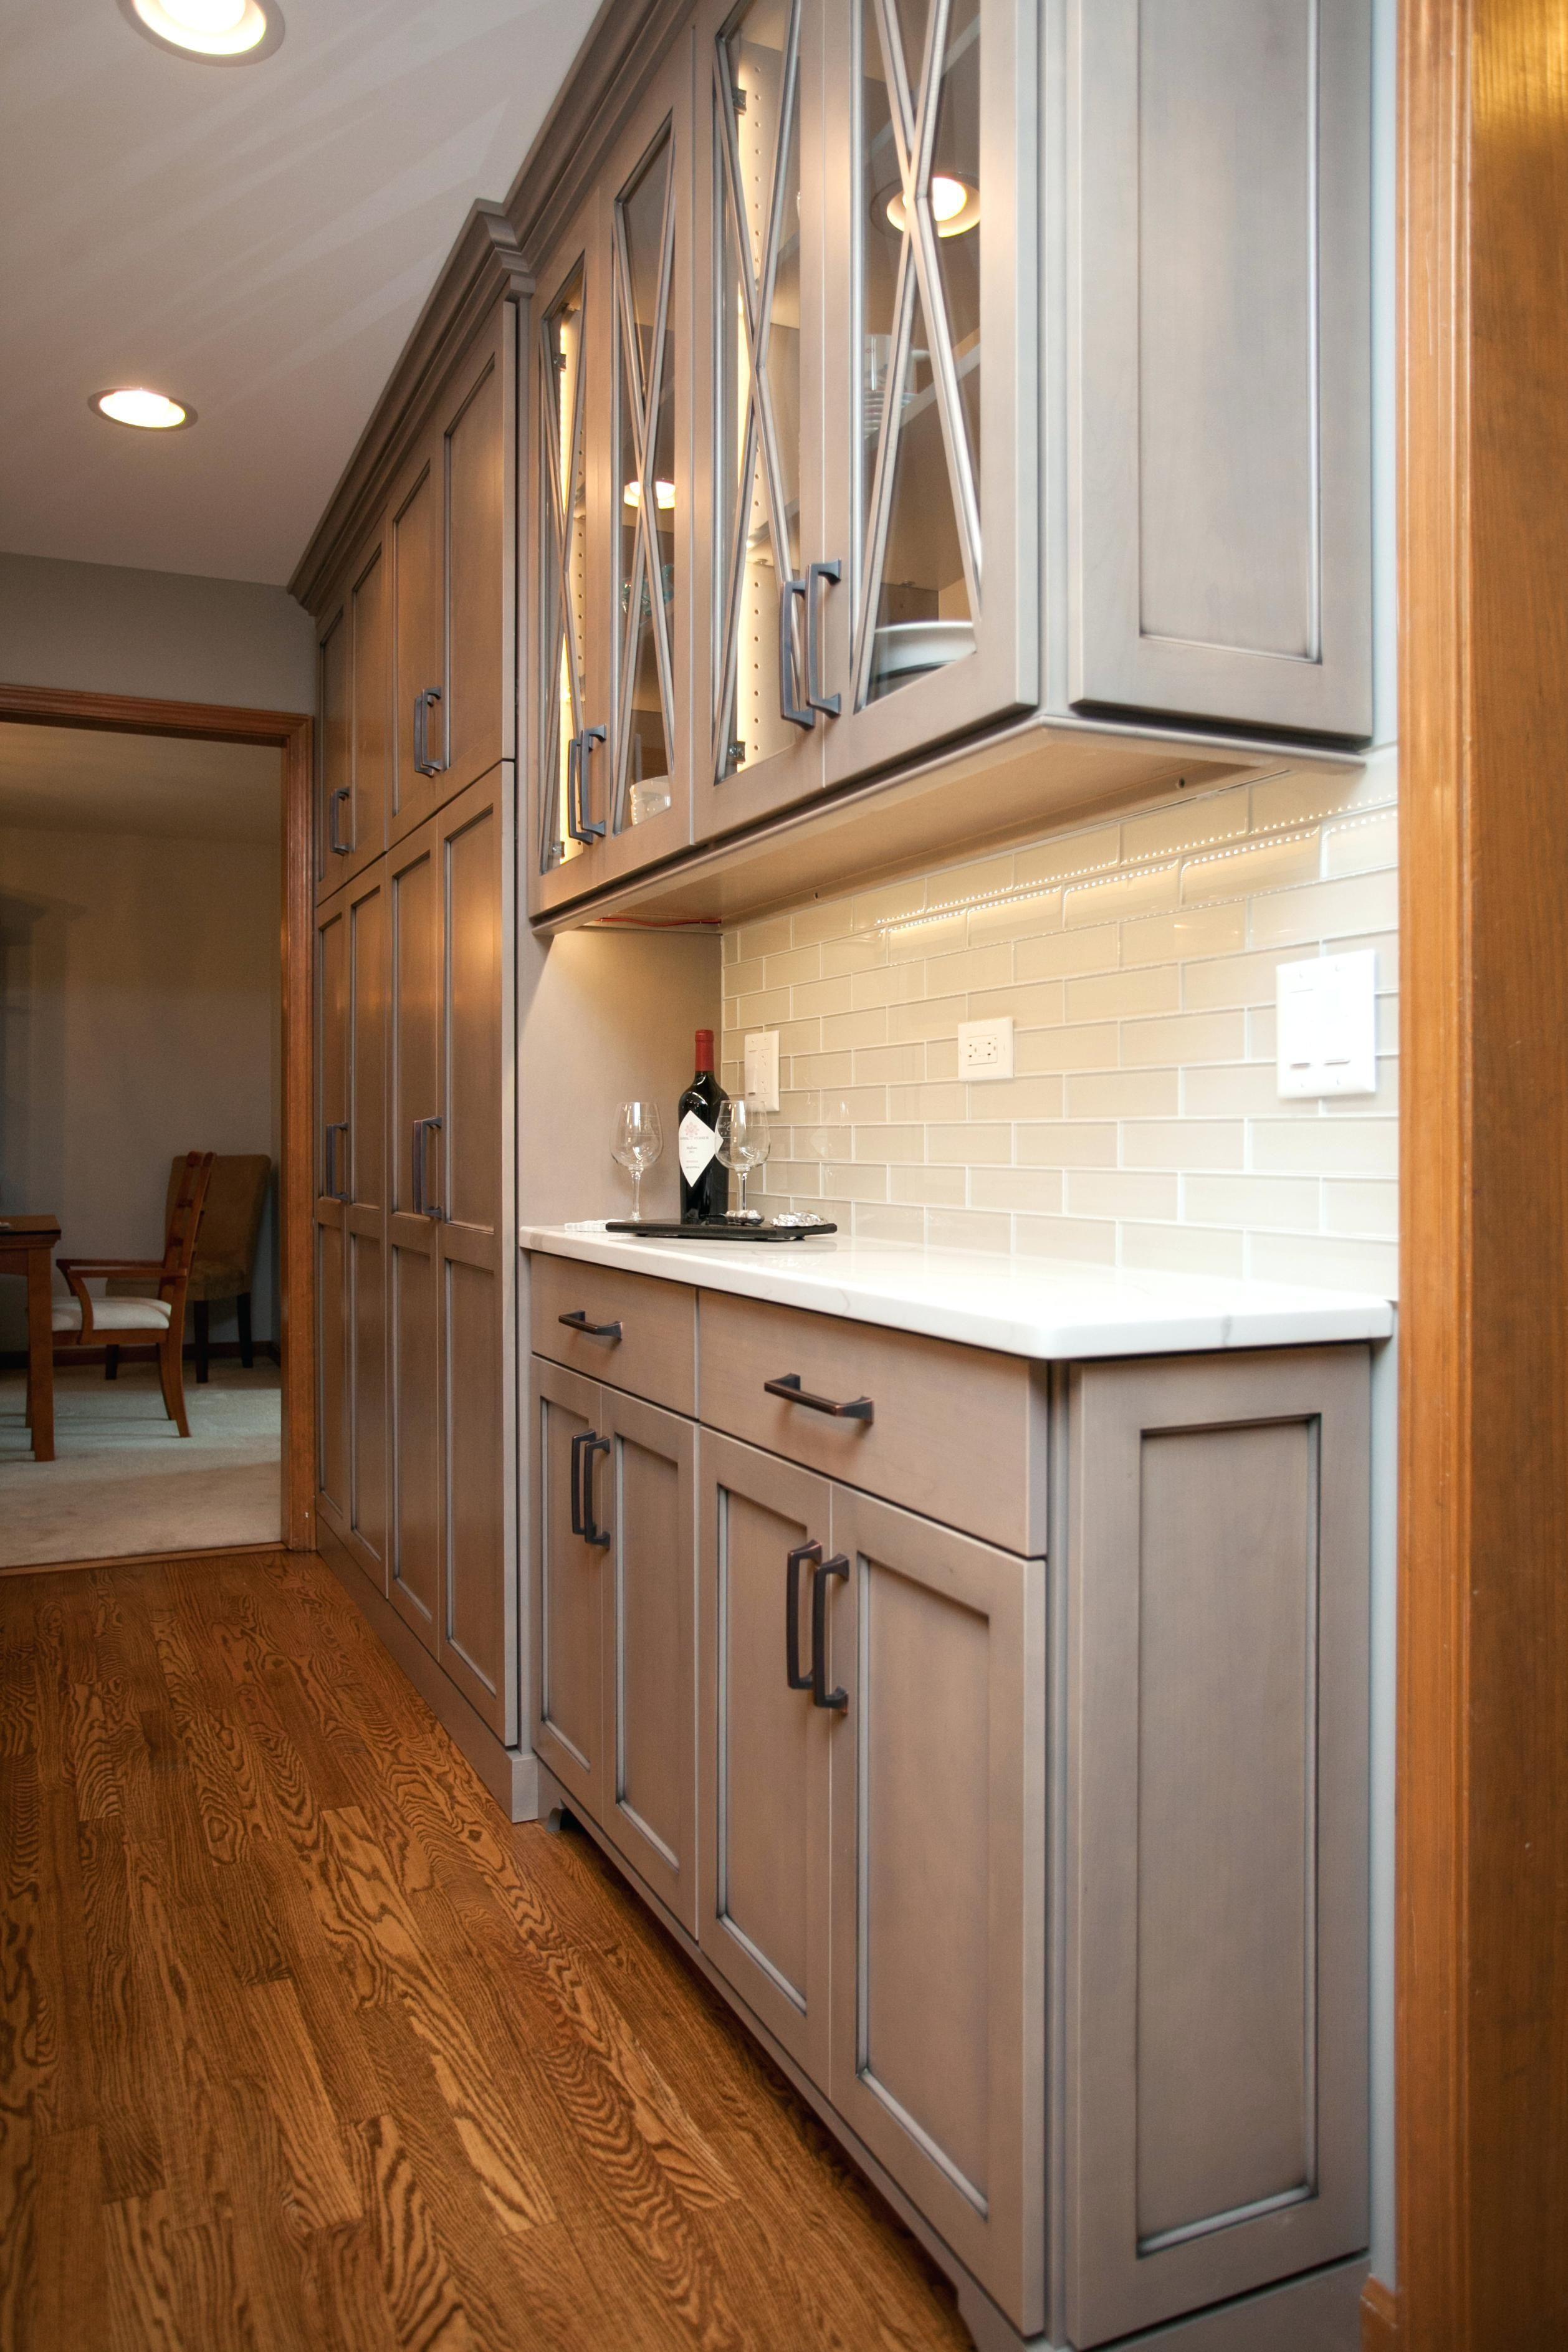 Shallow Depth Kitchen Base Cabinet Narrow Cabinet Kitchen